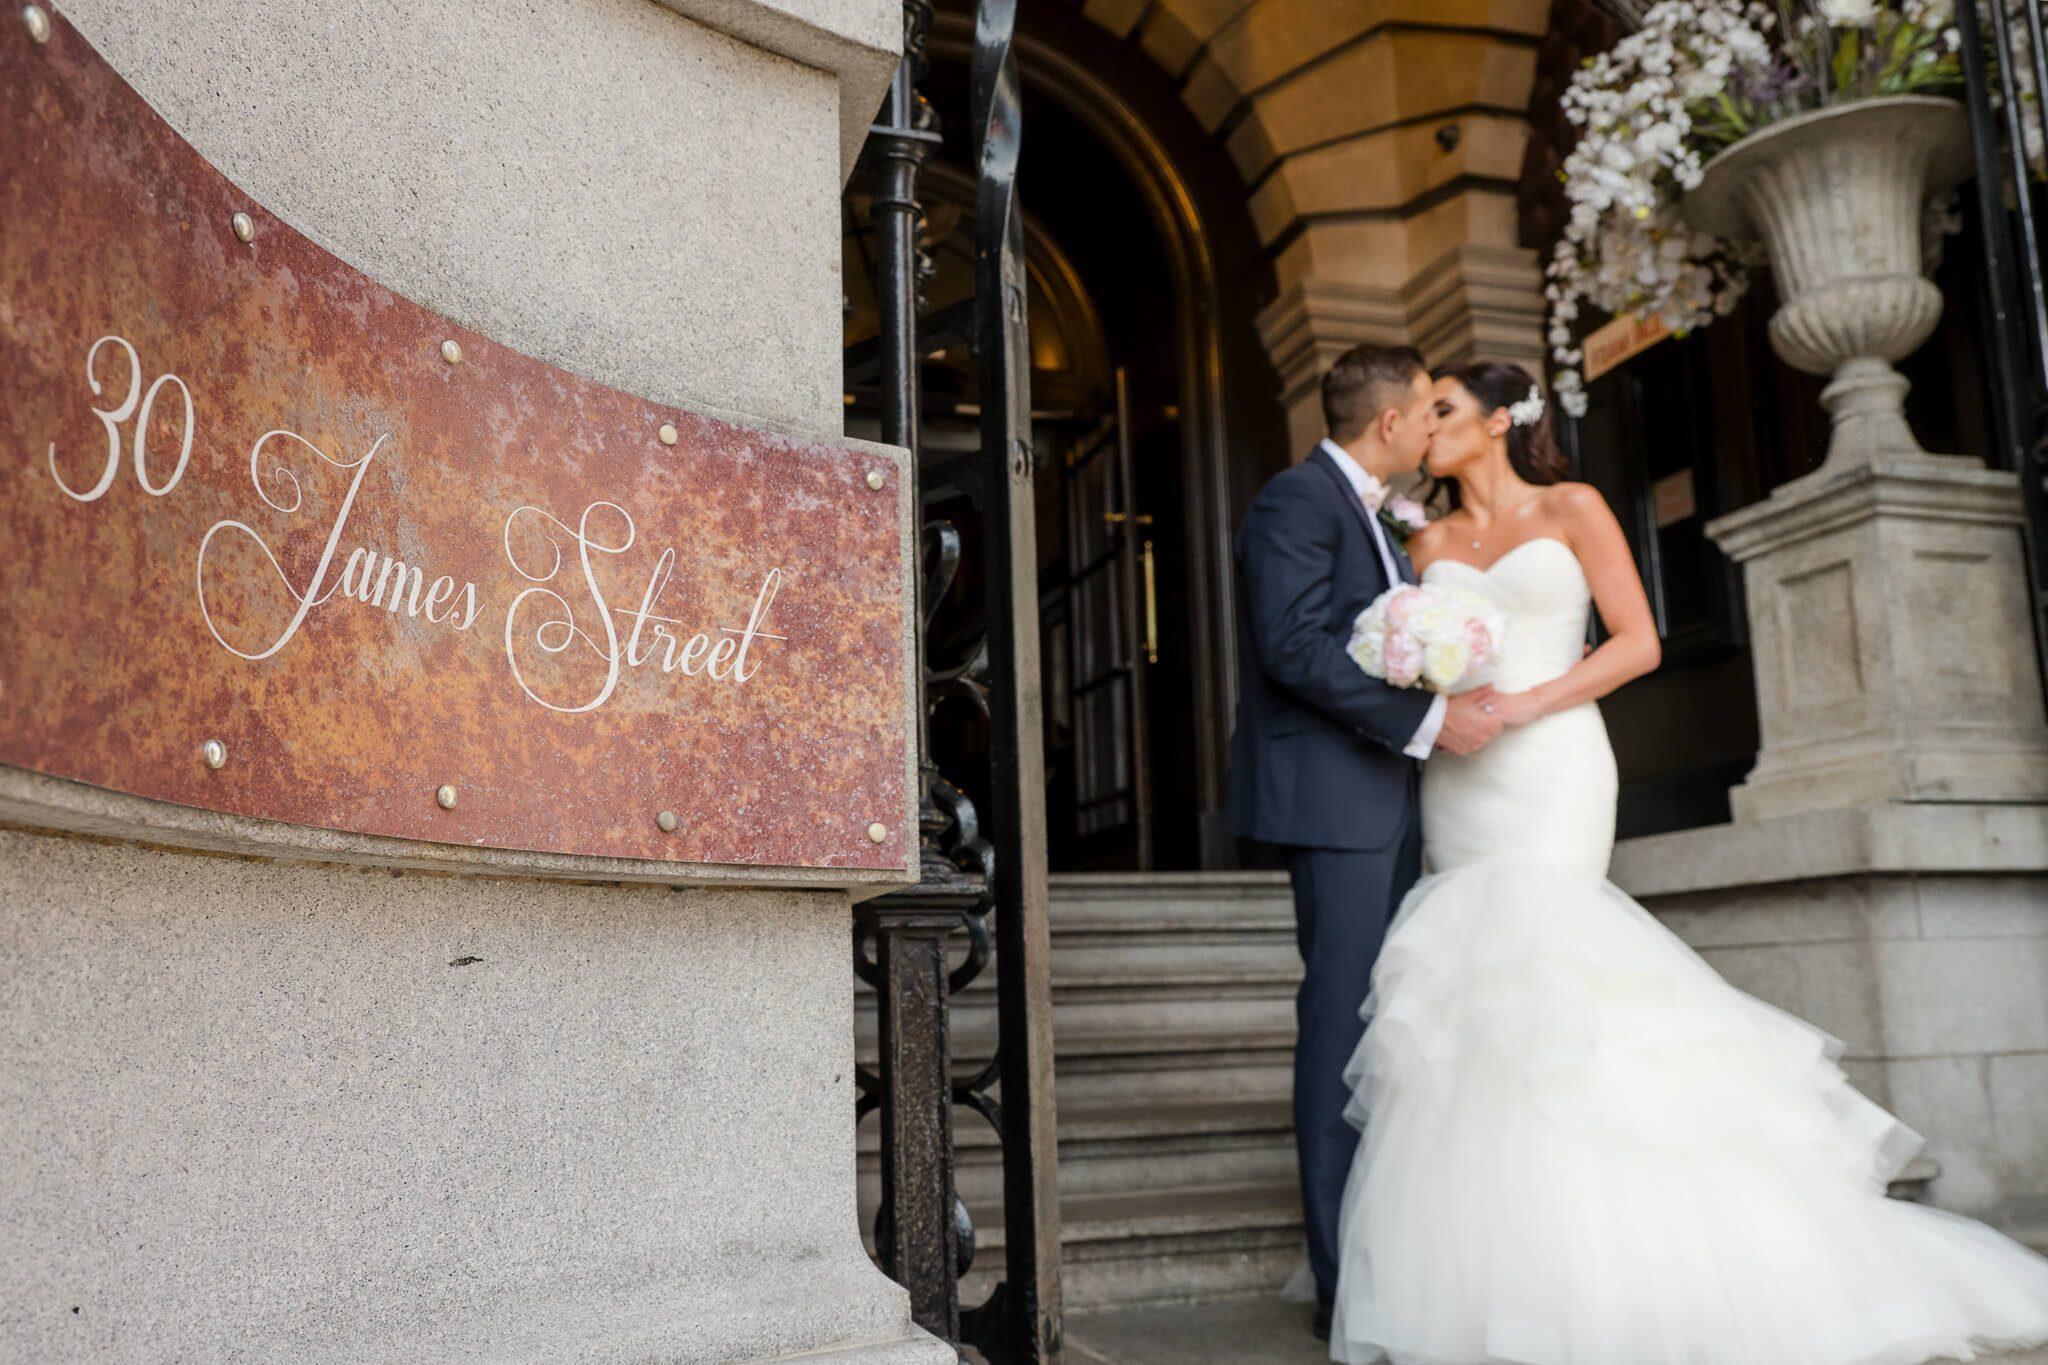 liverpool-wedding-30-james-street